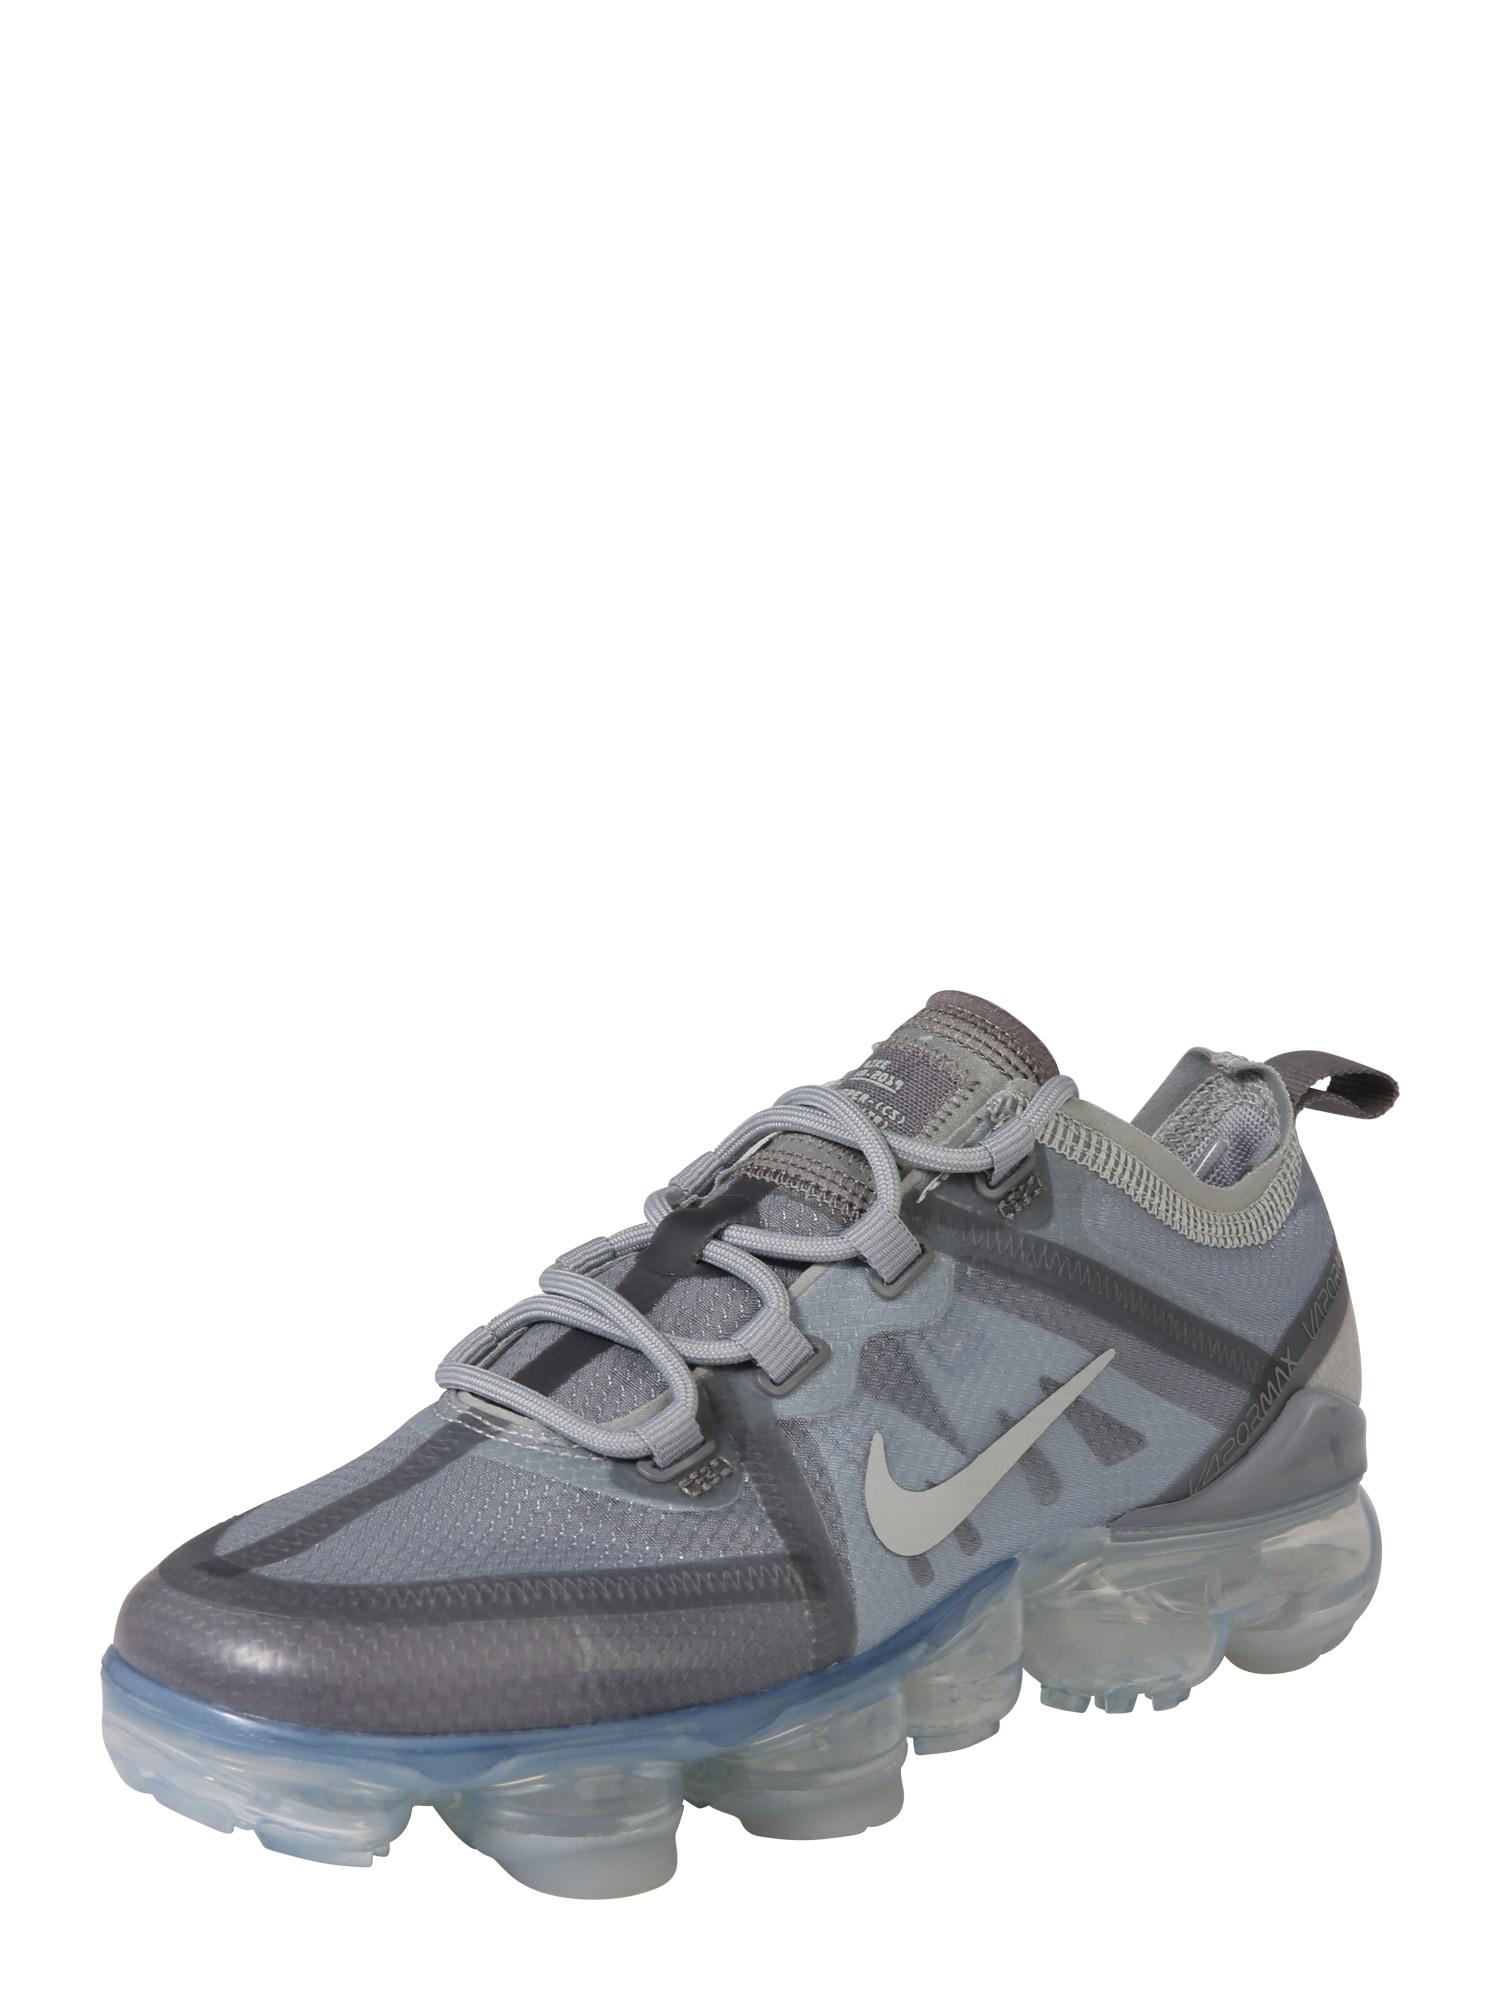 Tenisky Nike Air VaporMax 2019 šedá Nike Sportswear